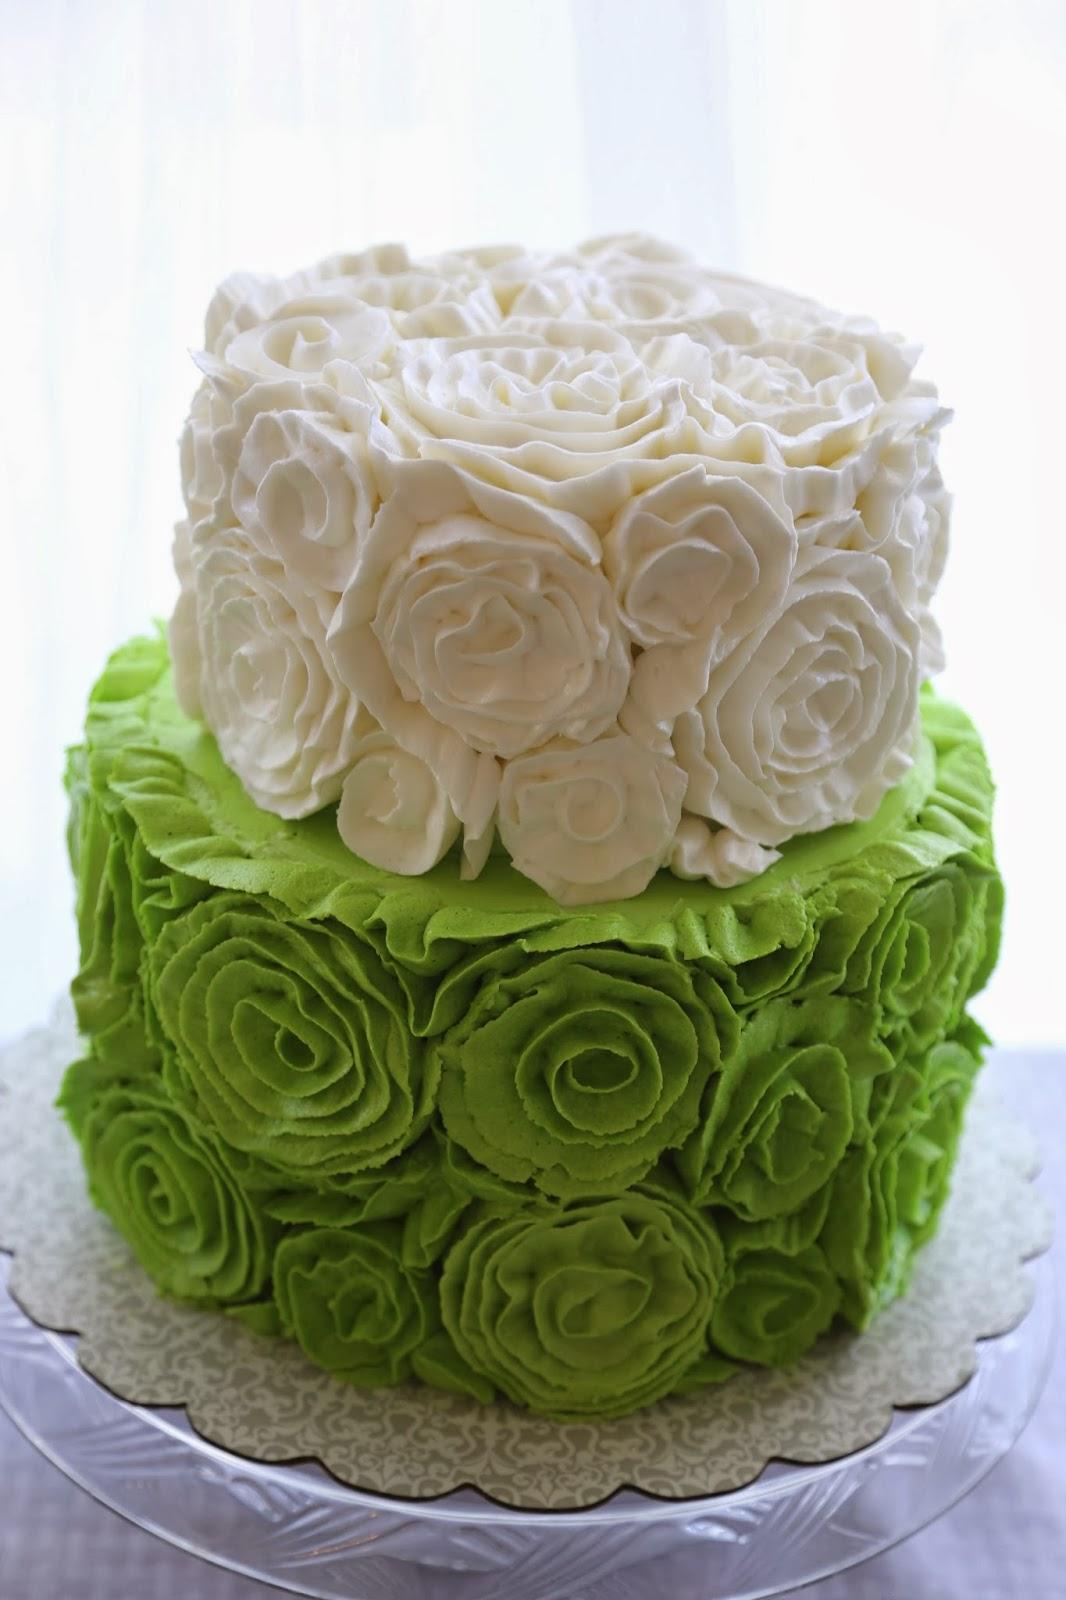 Sara Elizabeth - Custom Cakes & Gourmet Sweets: Fancy Buttercream Rosette Cake Tutorial